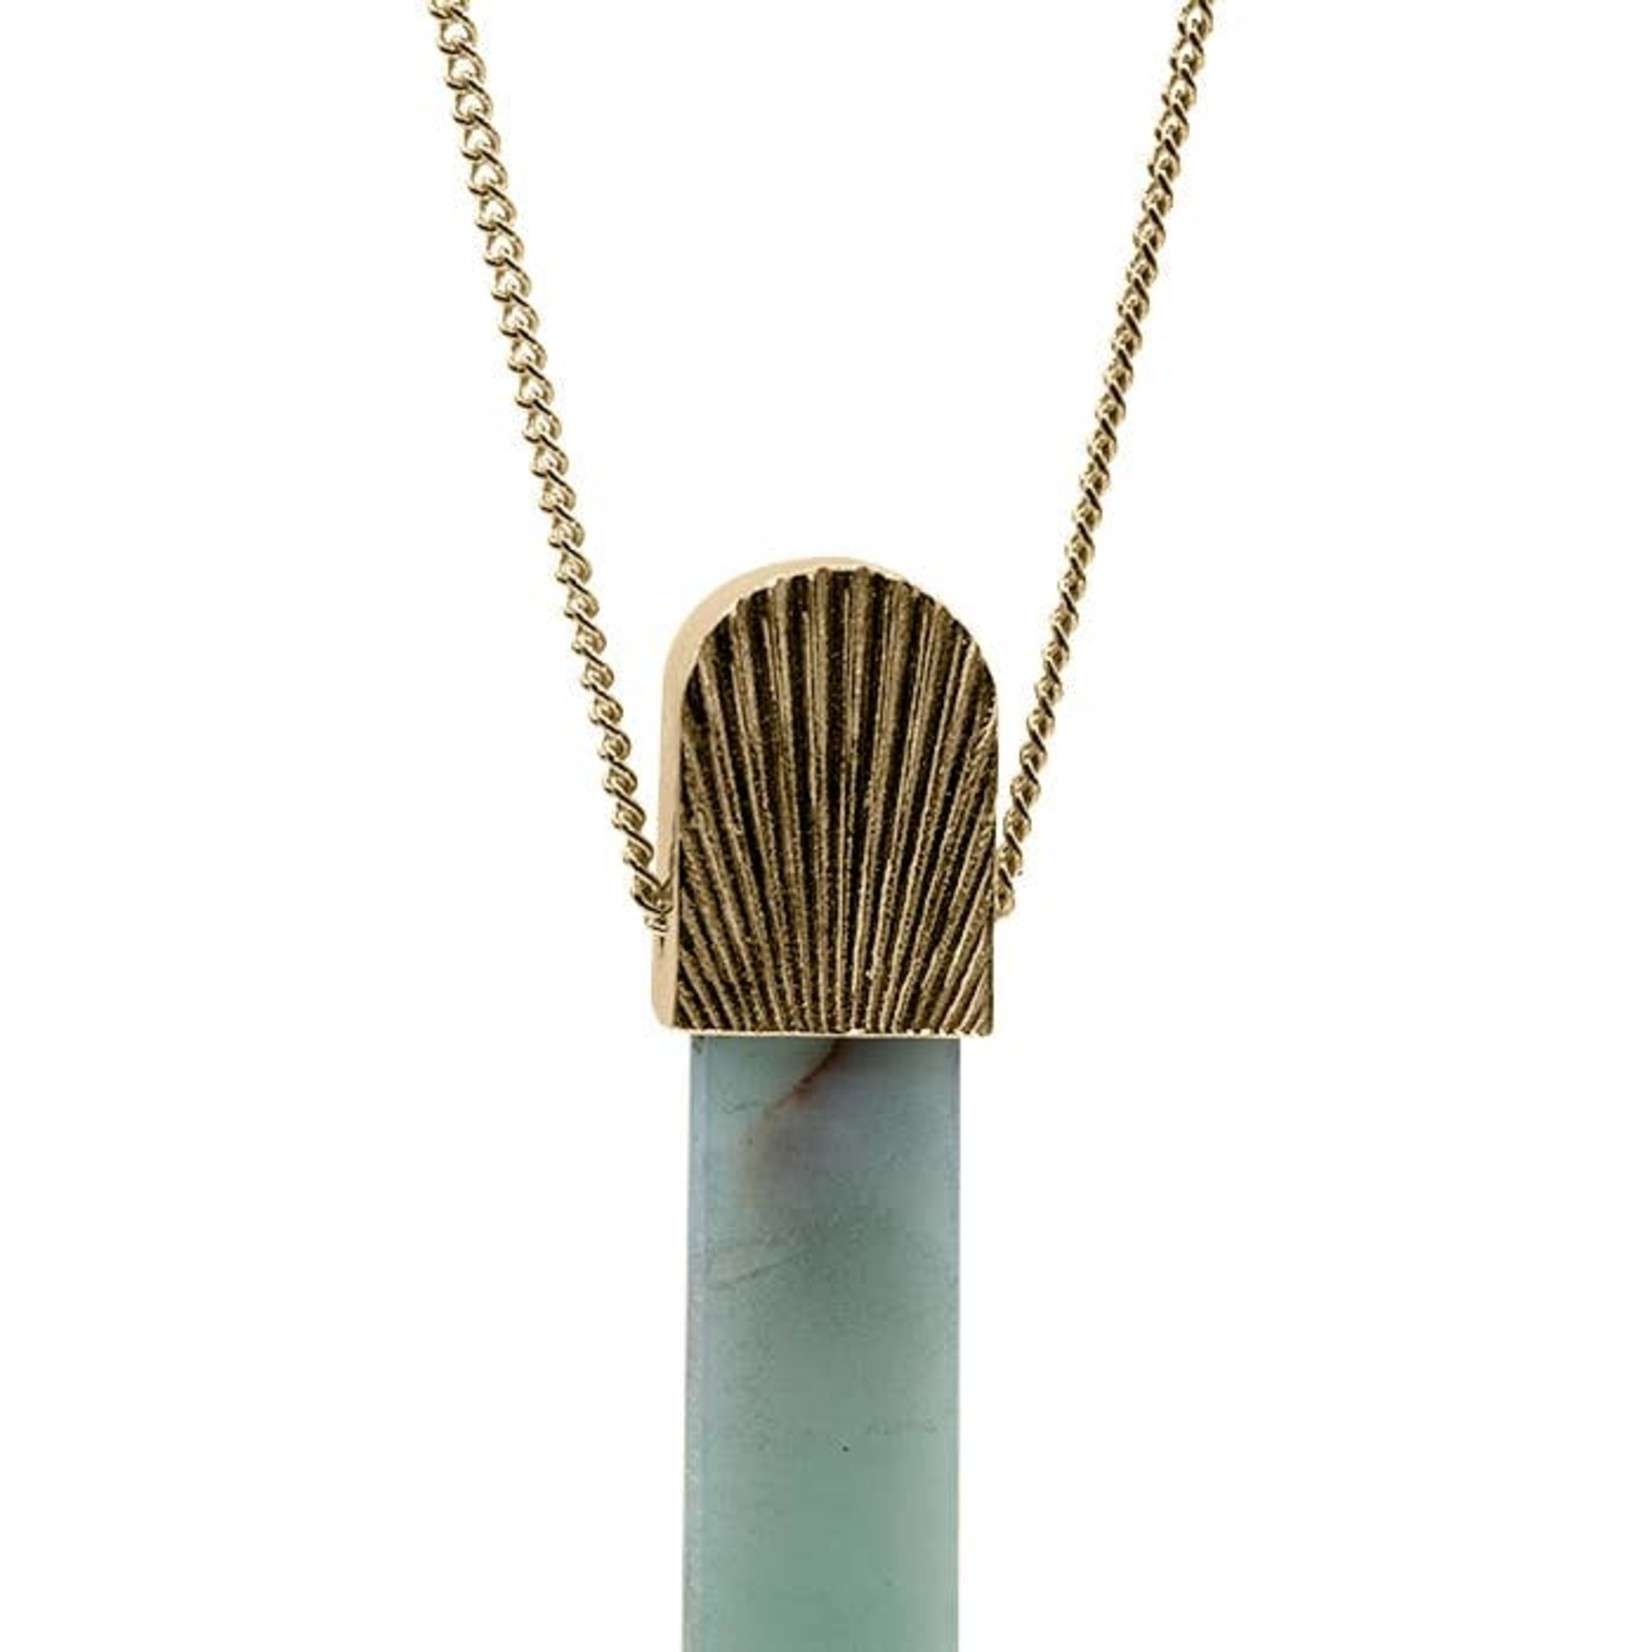 Mana Made Jewelry Mana Made Amazonite Sunburst Necklace